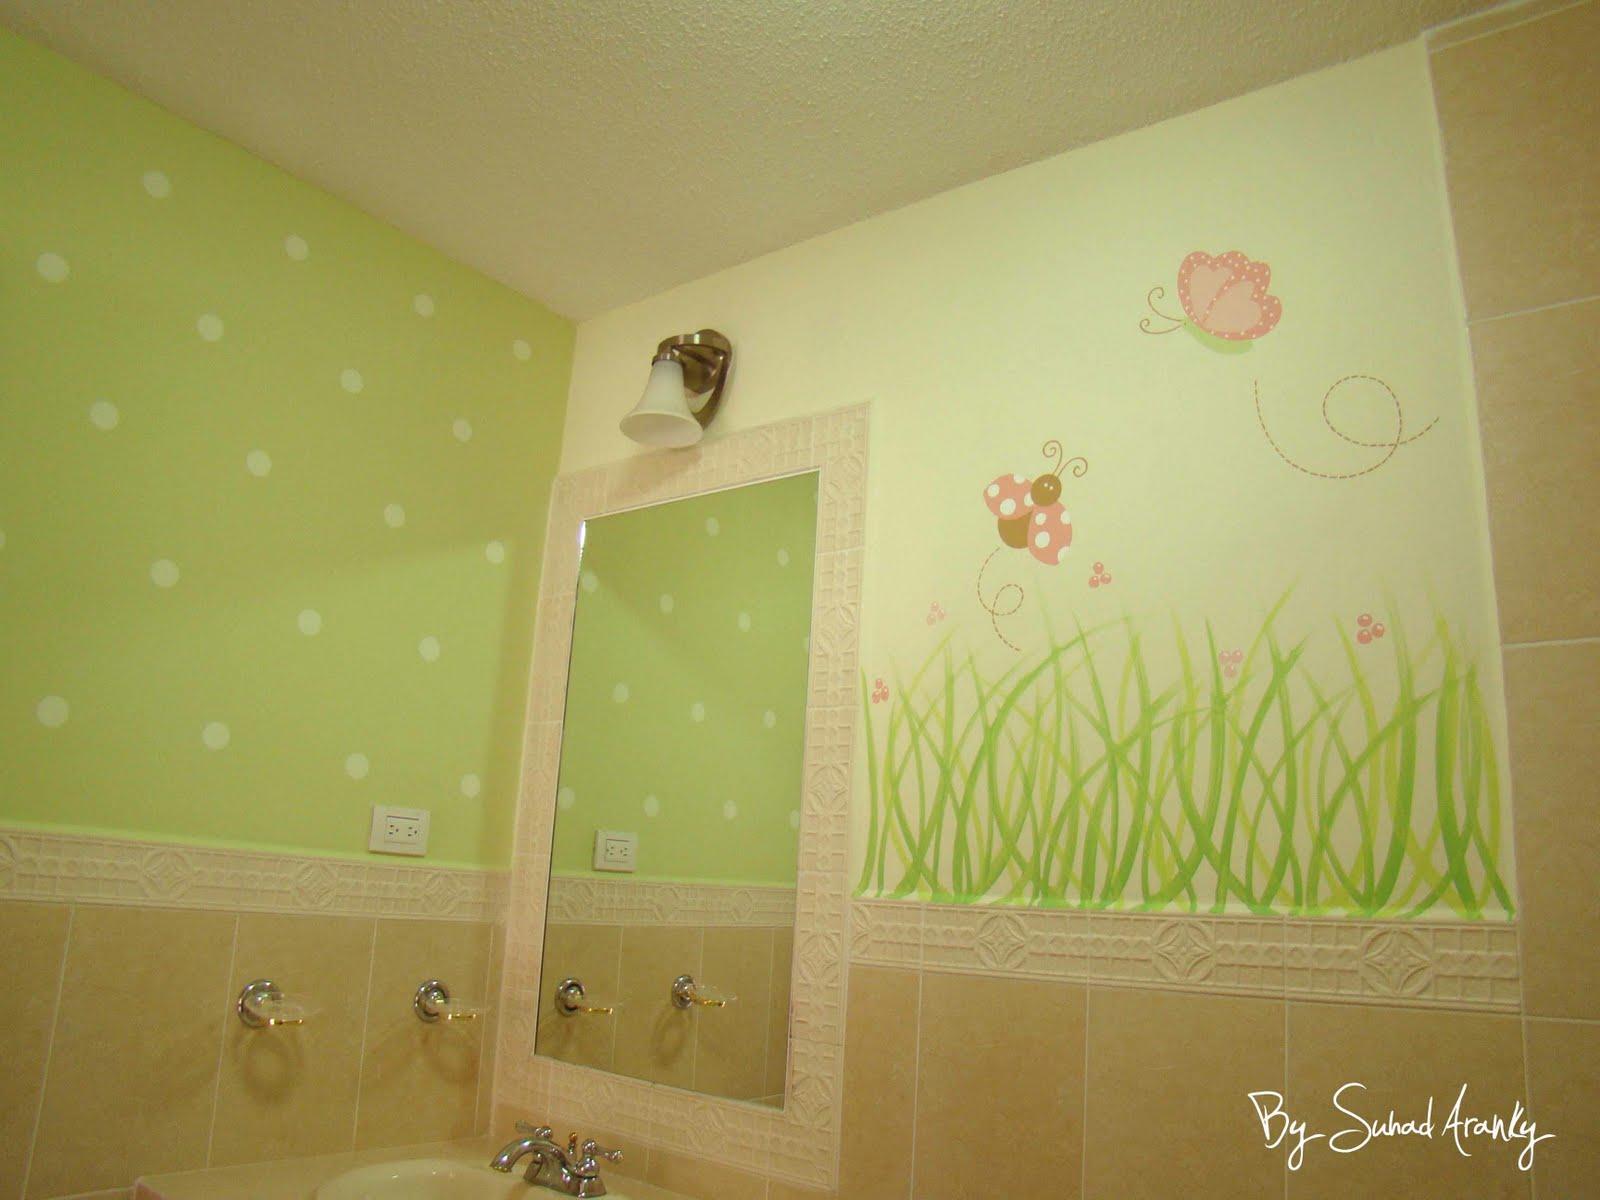 Imagenes De Baño Infantiles:Murales en Baños